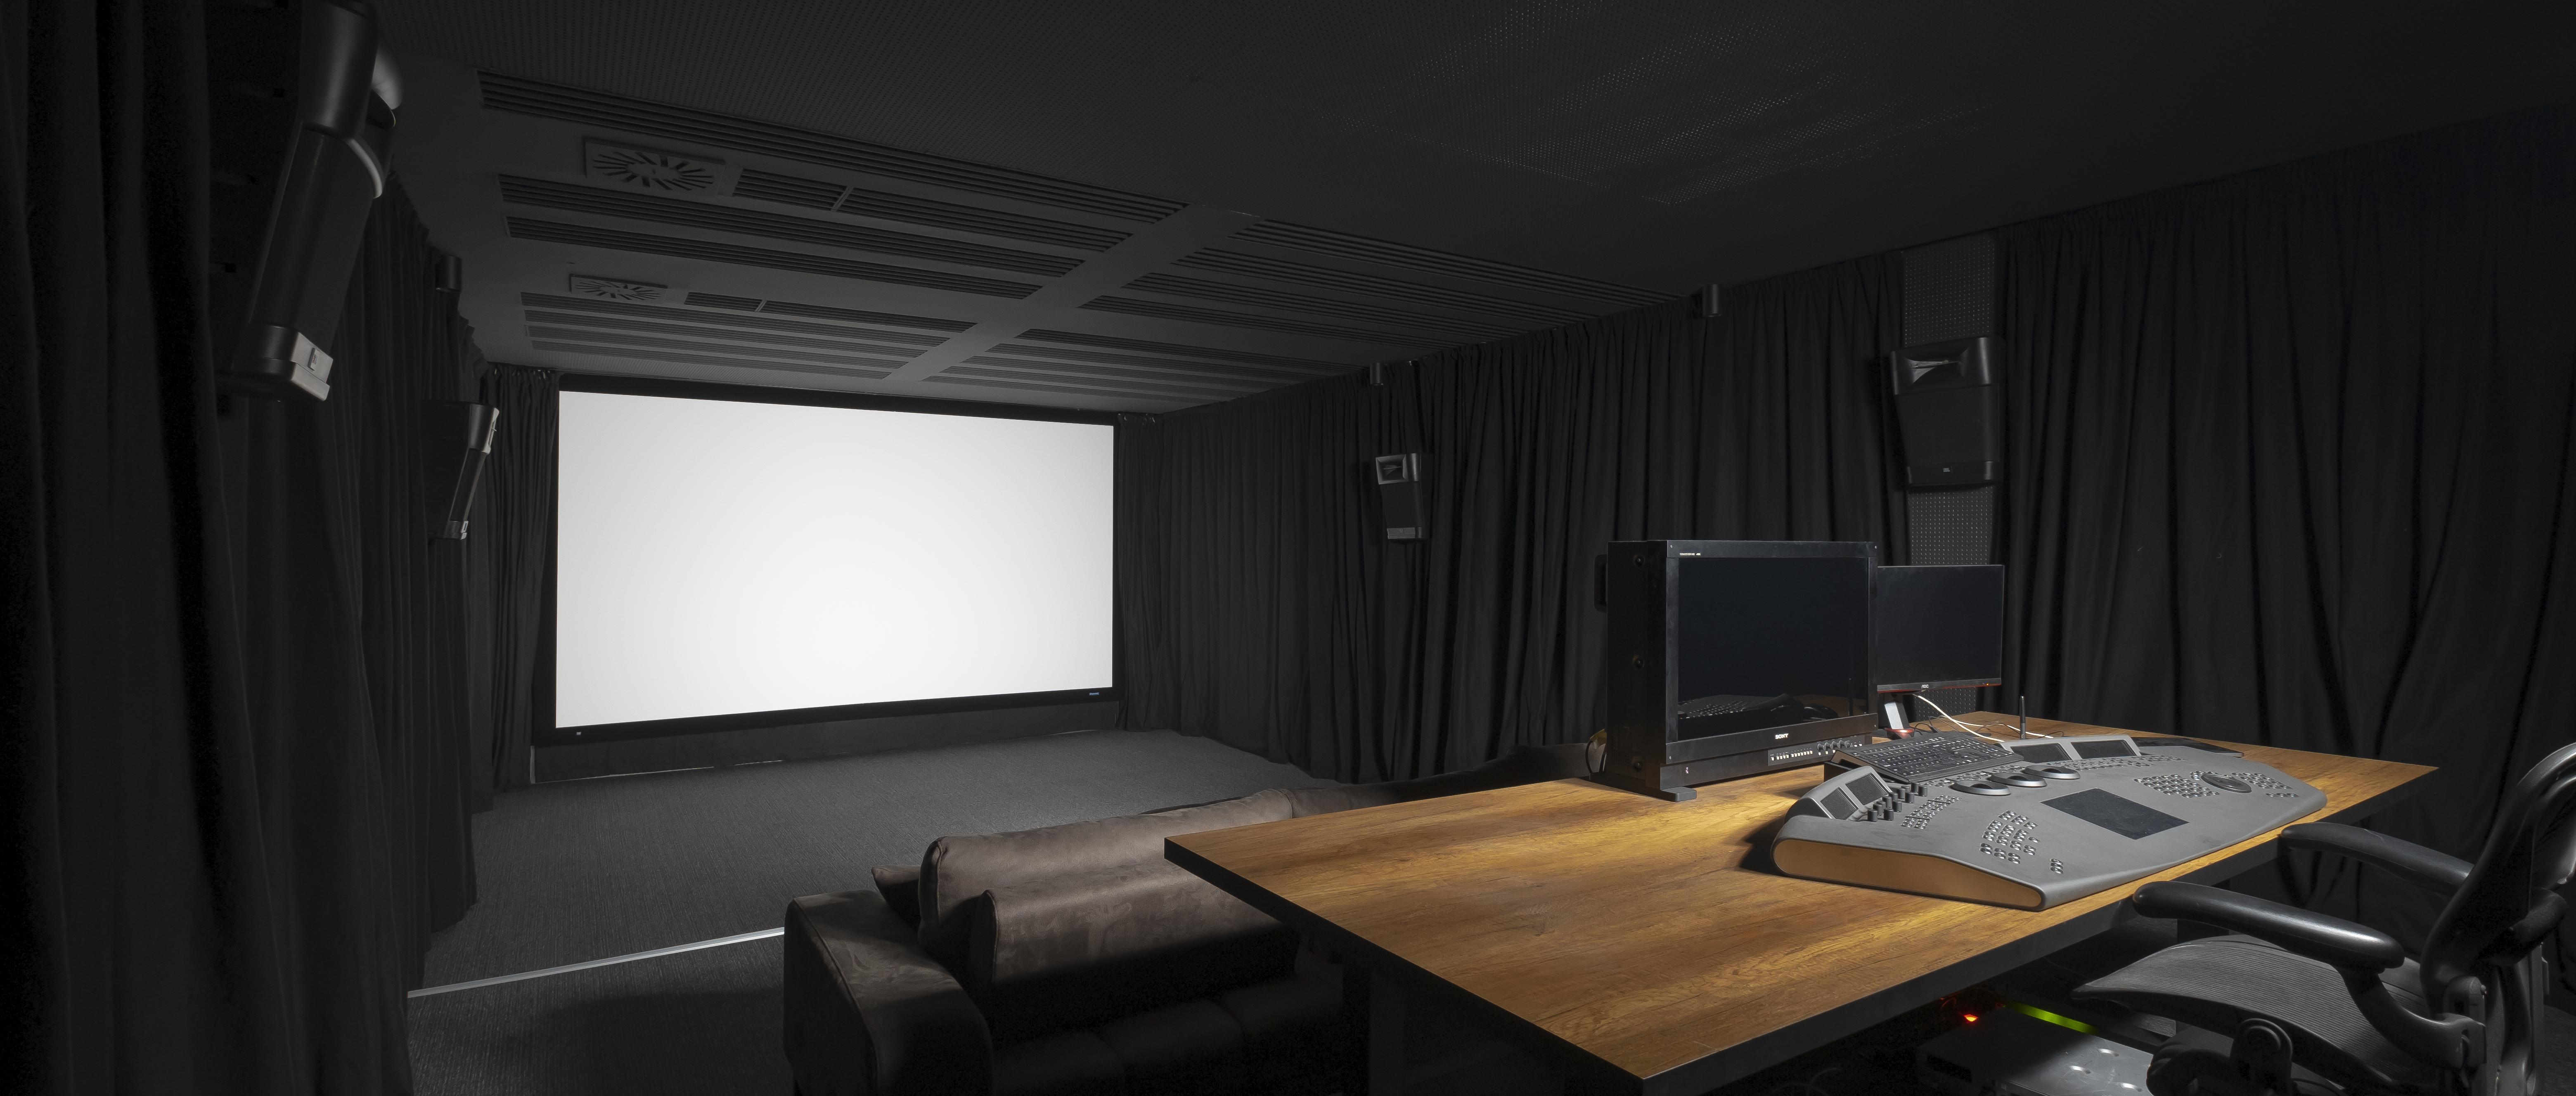 New post-production facility 247HUB opens its doors